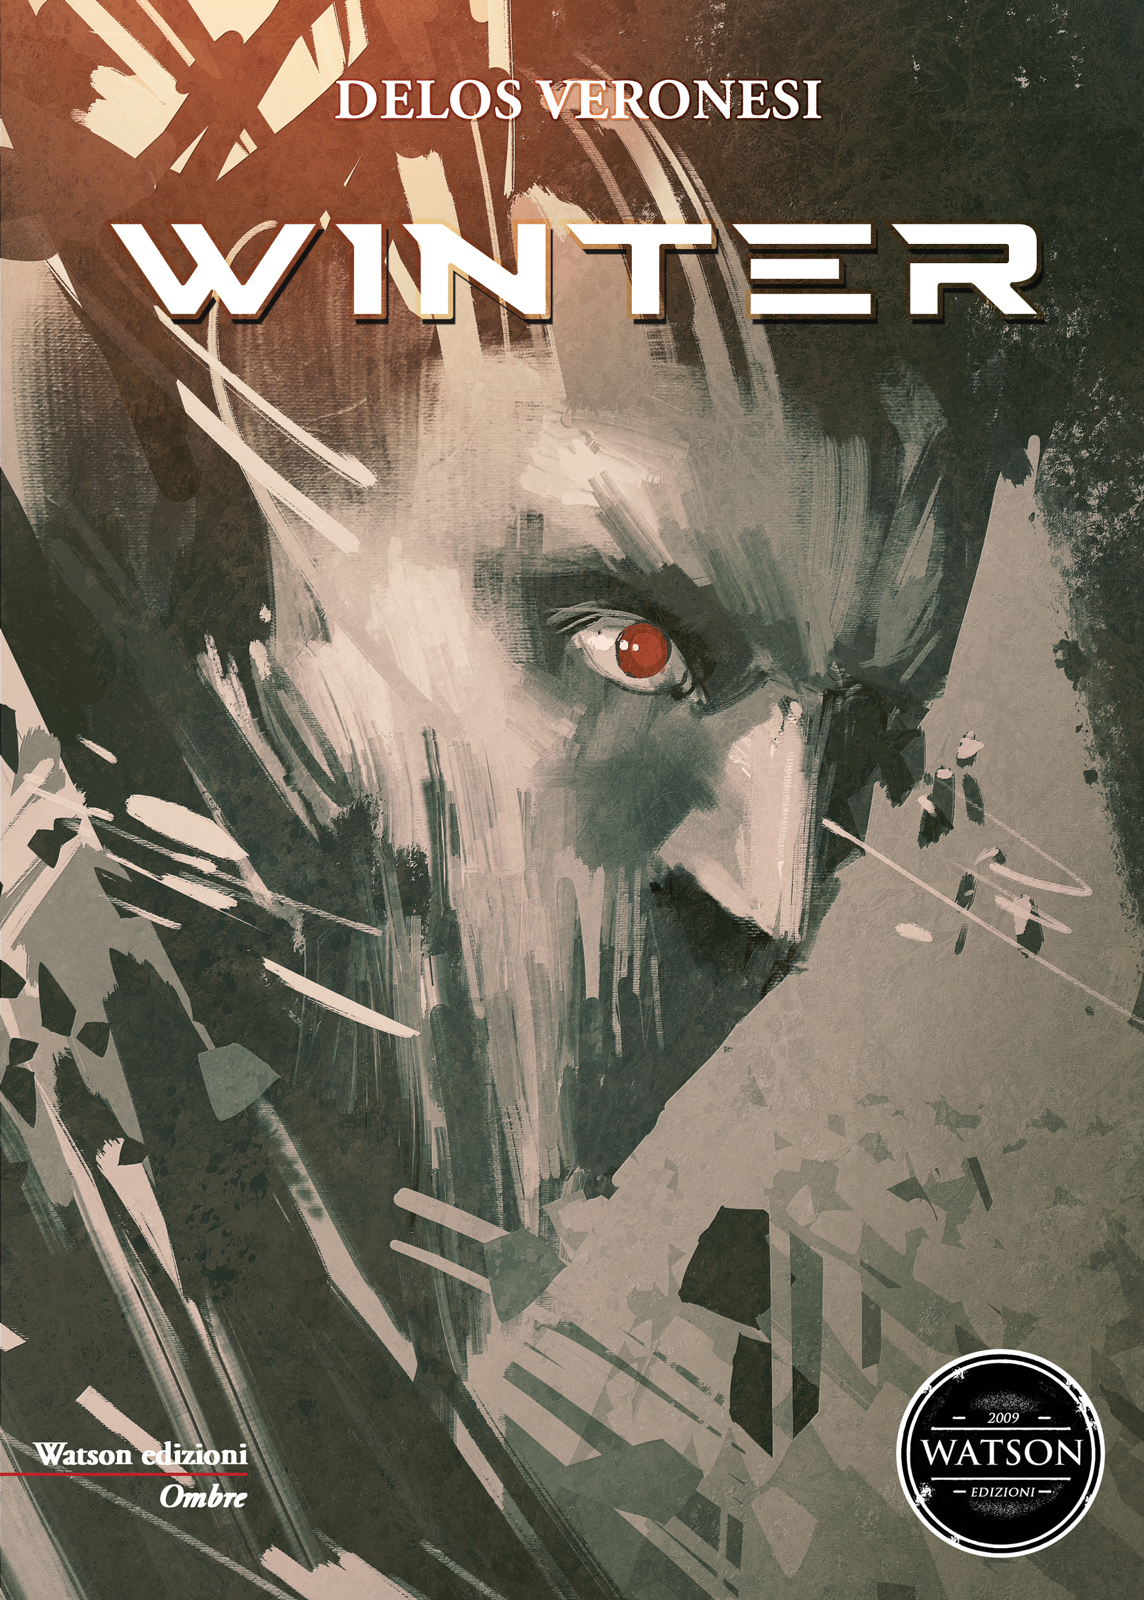 Delos Veronesi - Winter (Watson, 2016) 2 - fanzine